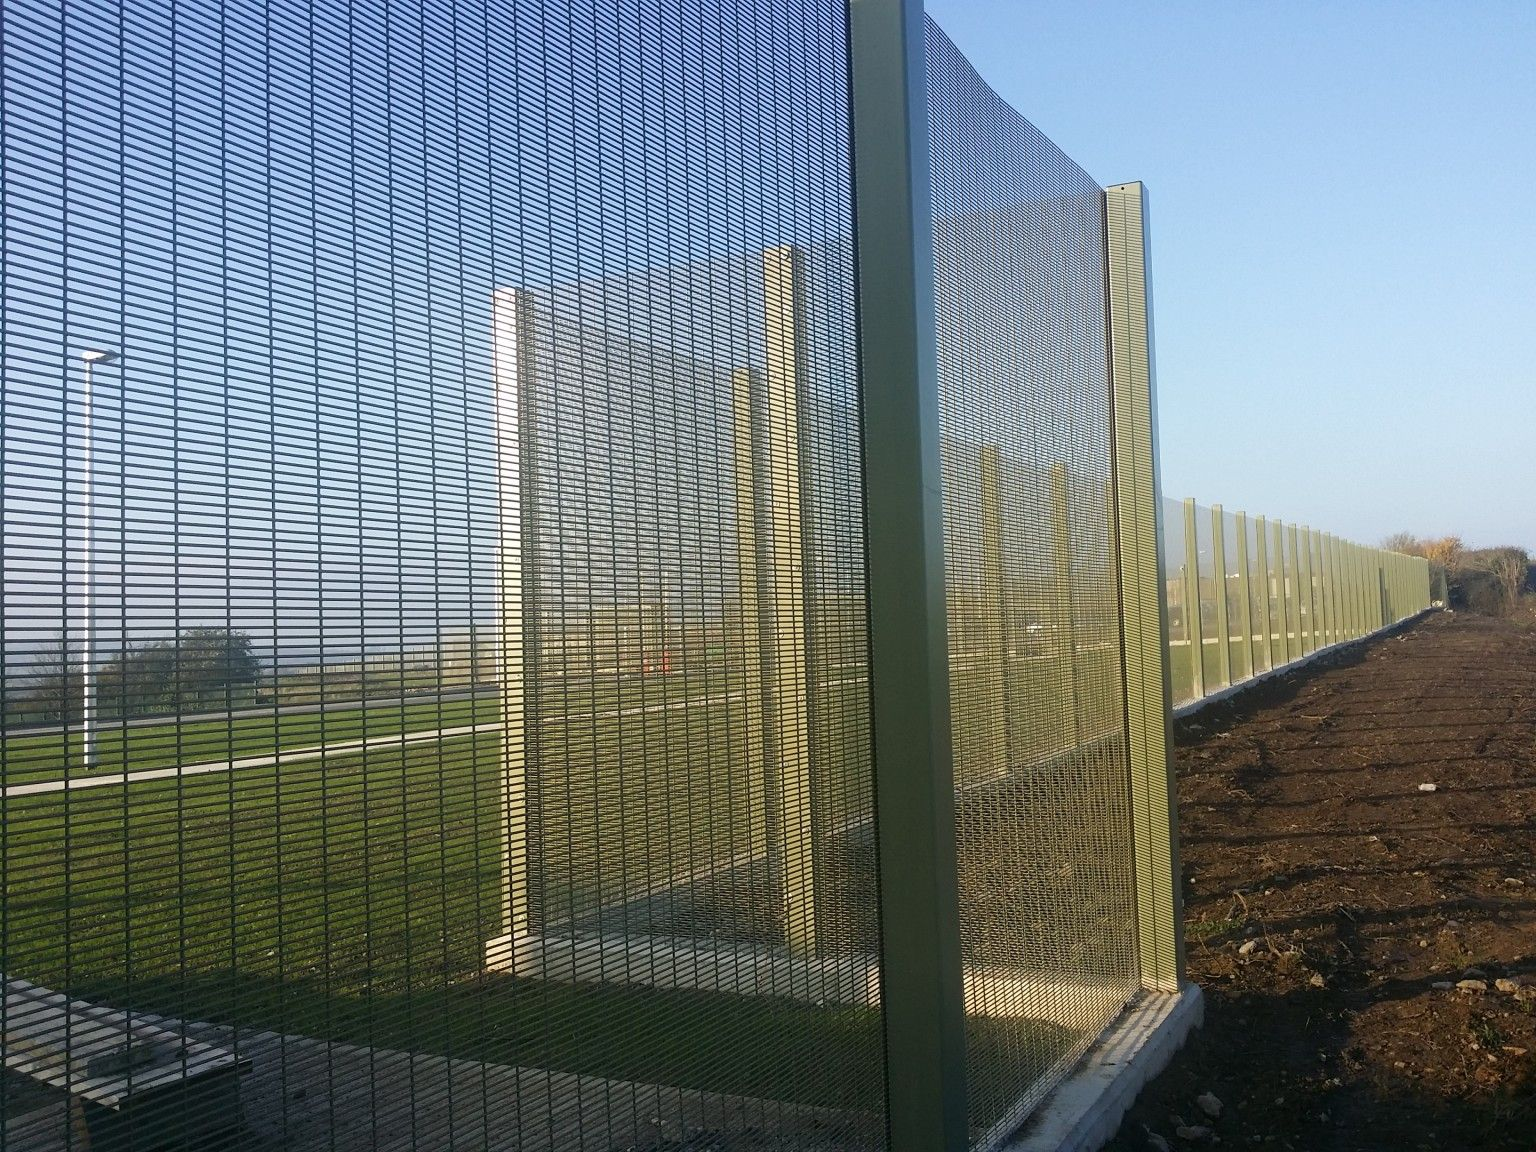 Irish Fencing & Railings Ltd. Mesh Perimeter Range A05 -358 Mesh (100)